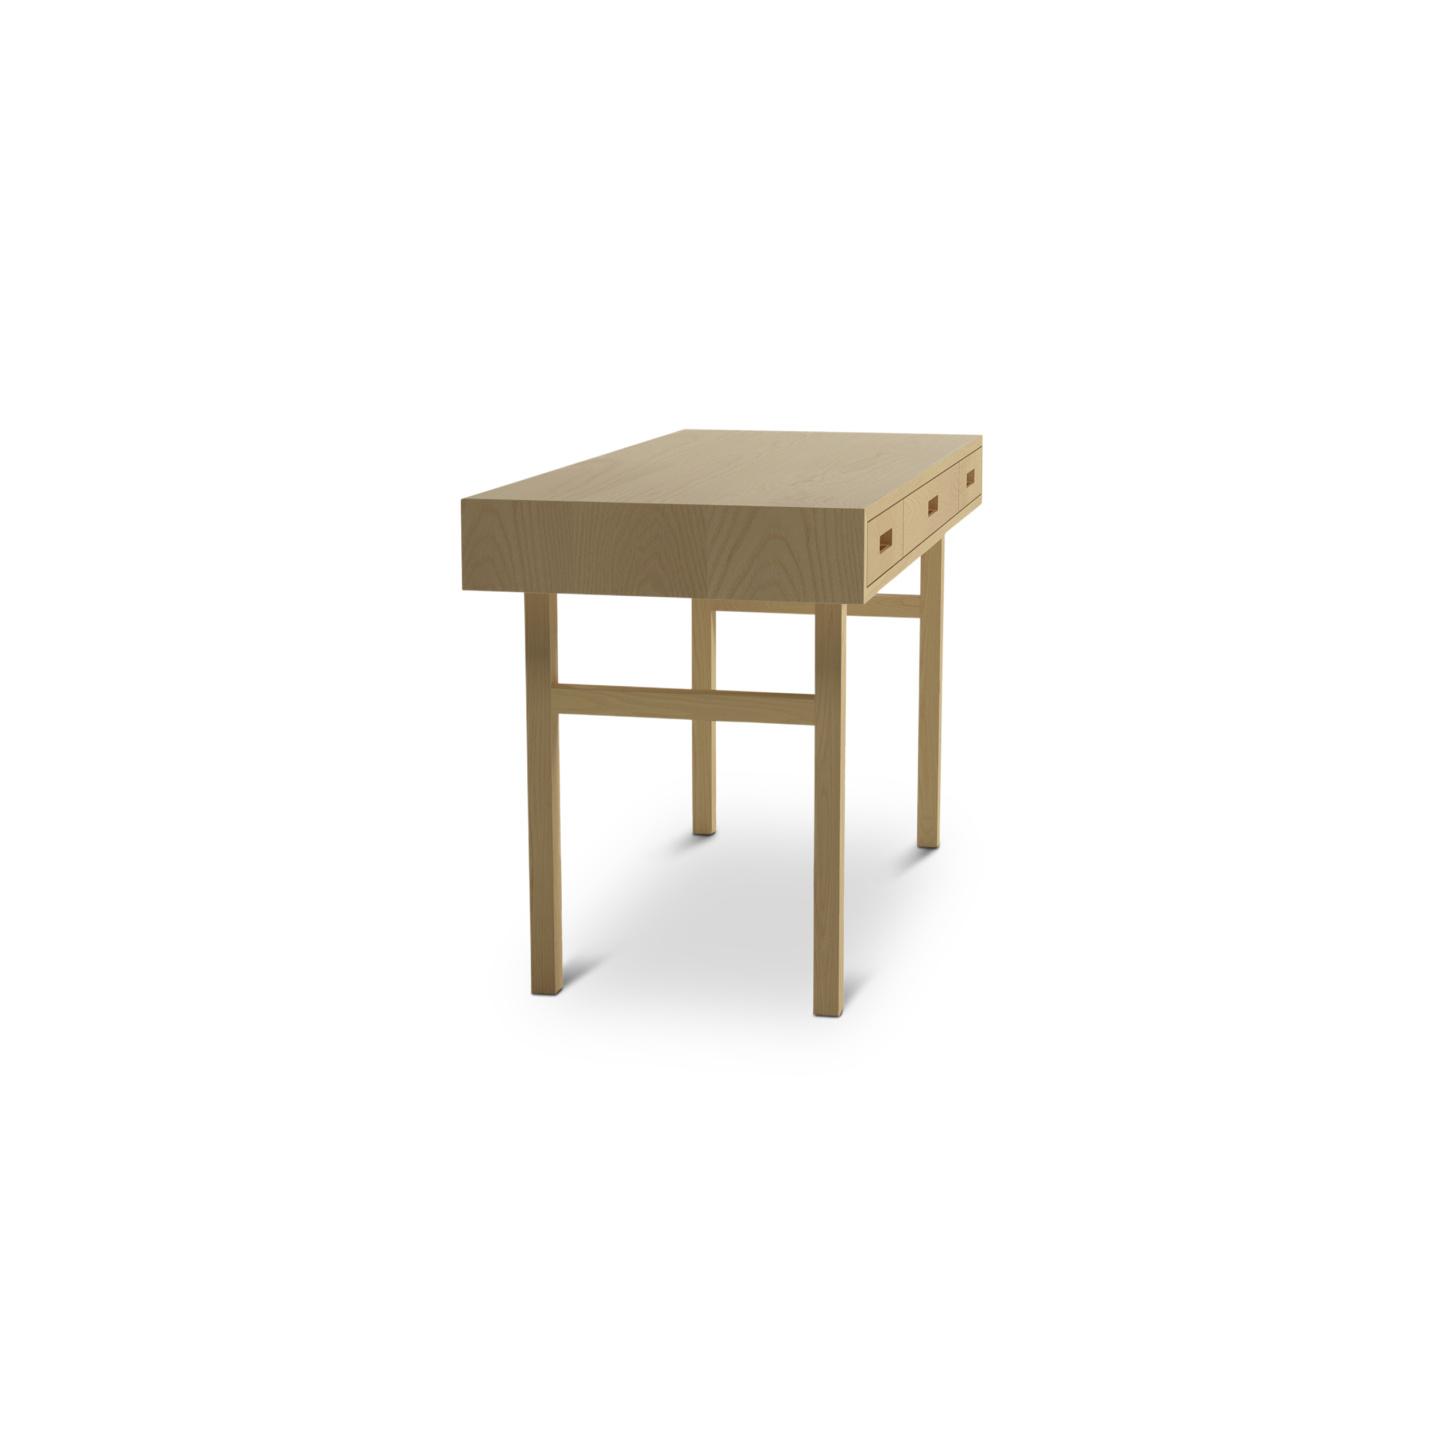 Ash nordic desk